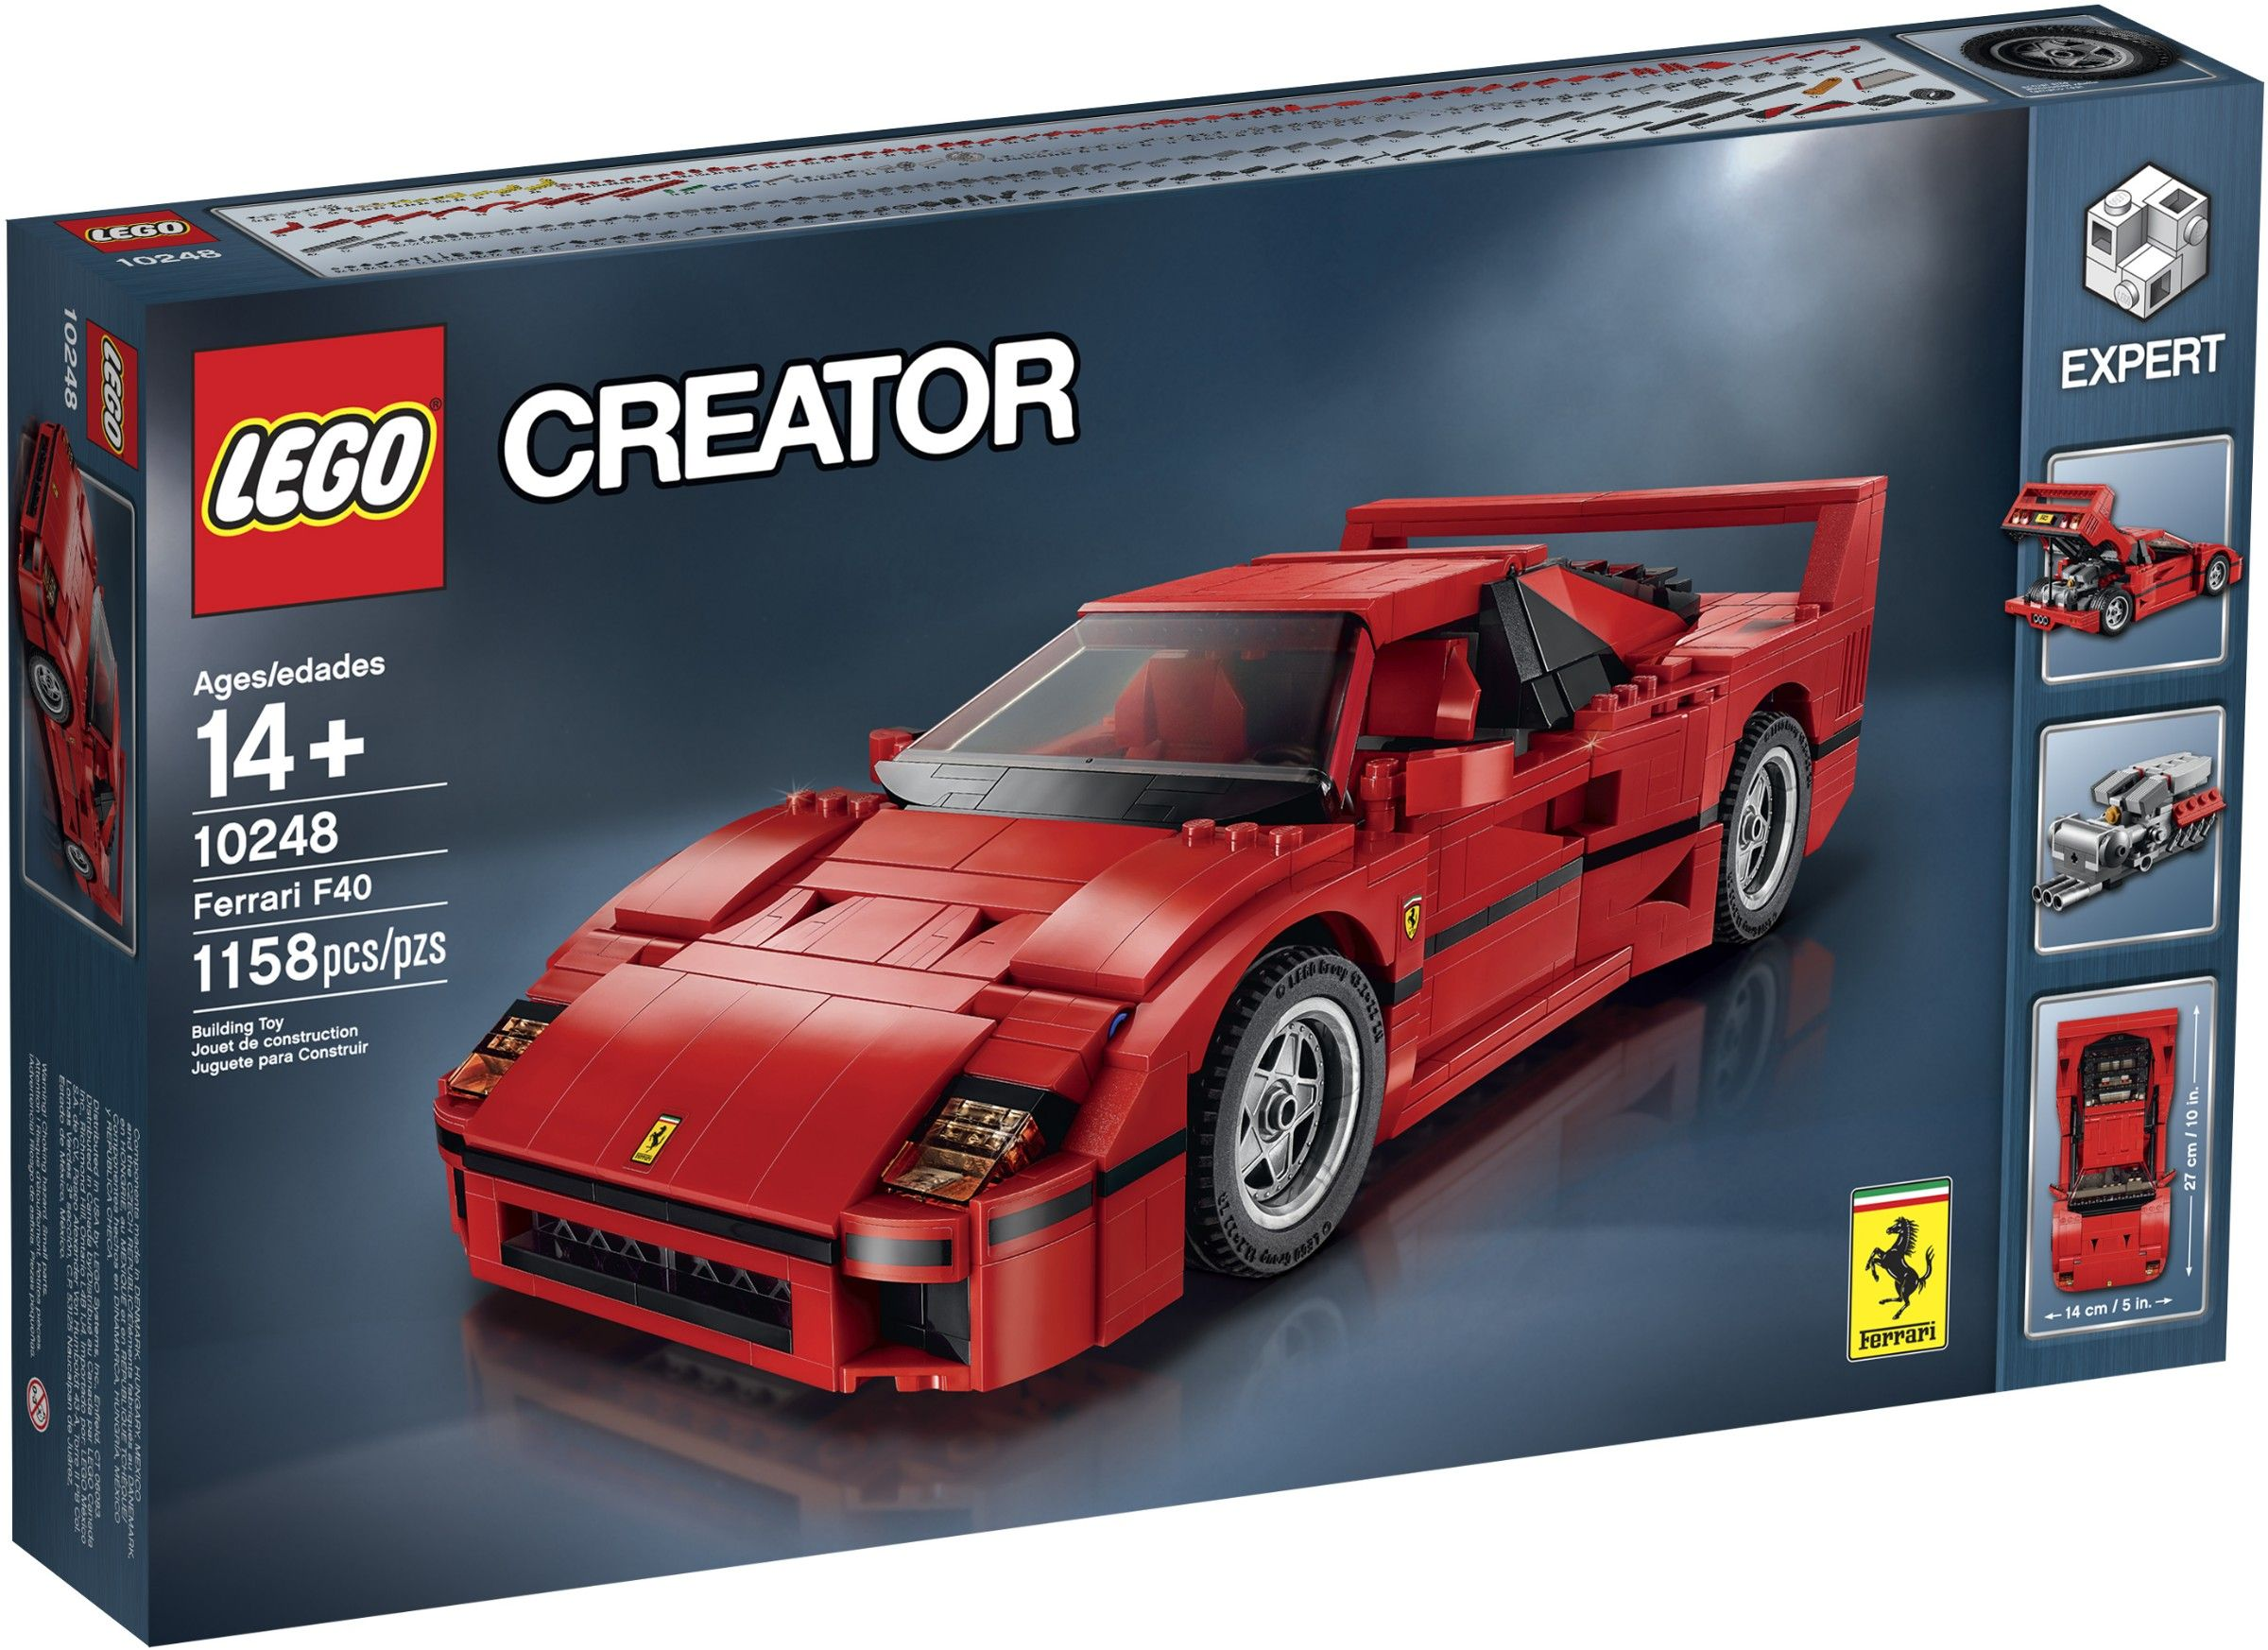 Best Sale Gift Lego 10248 Ferrari F40 10248 1158 14 2015 93 Bootlegbricks Bricks Cheapbricks Knockofflego Ferrari F40 Lego Cars Lego Creator